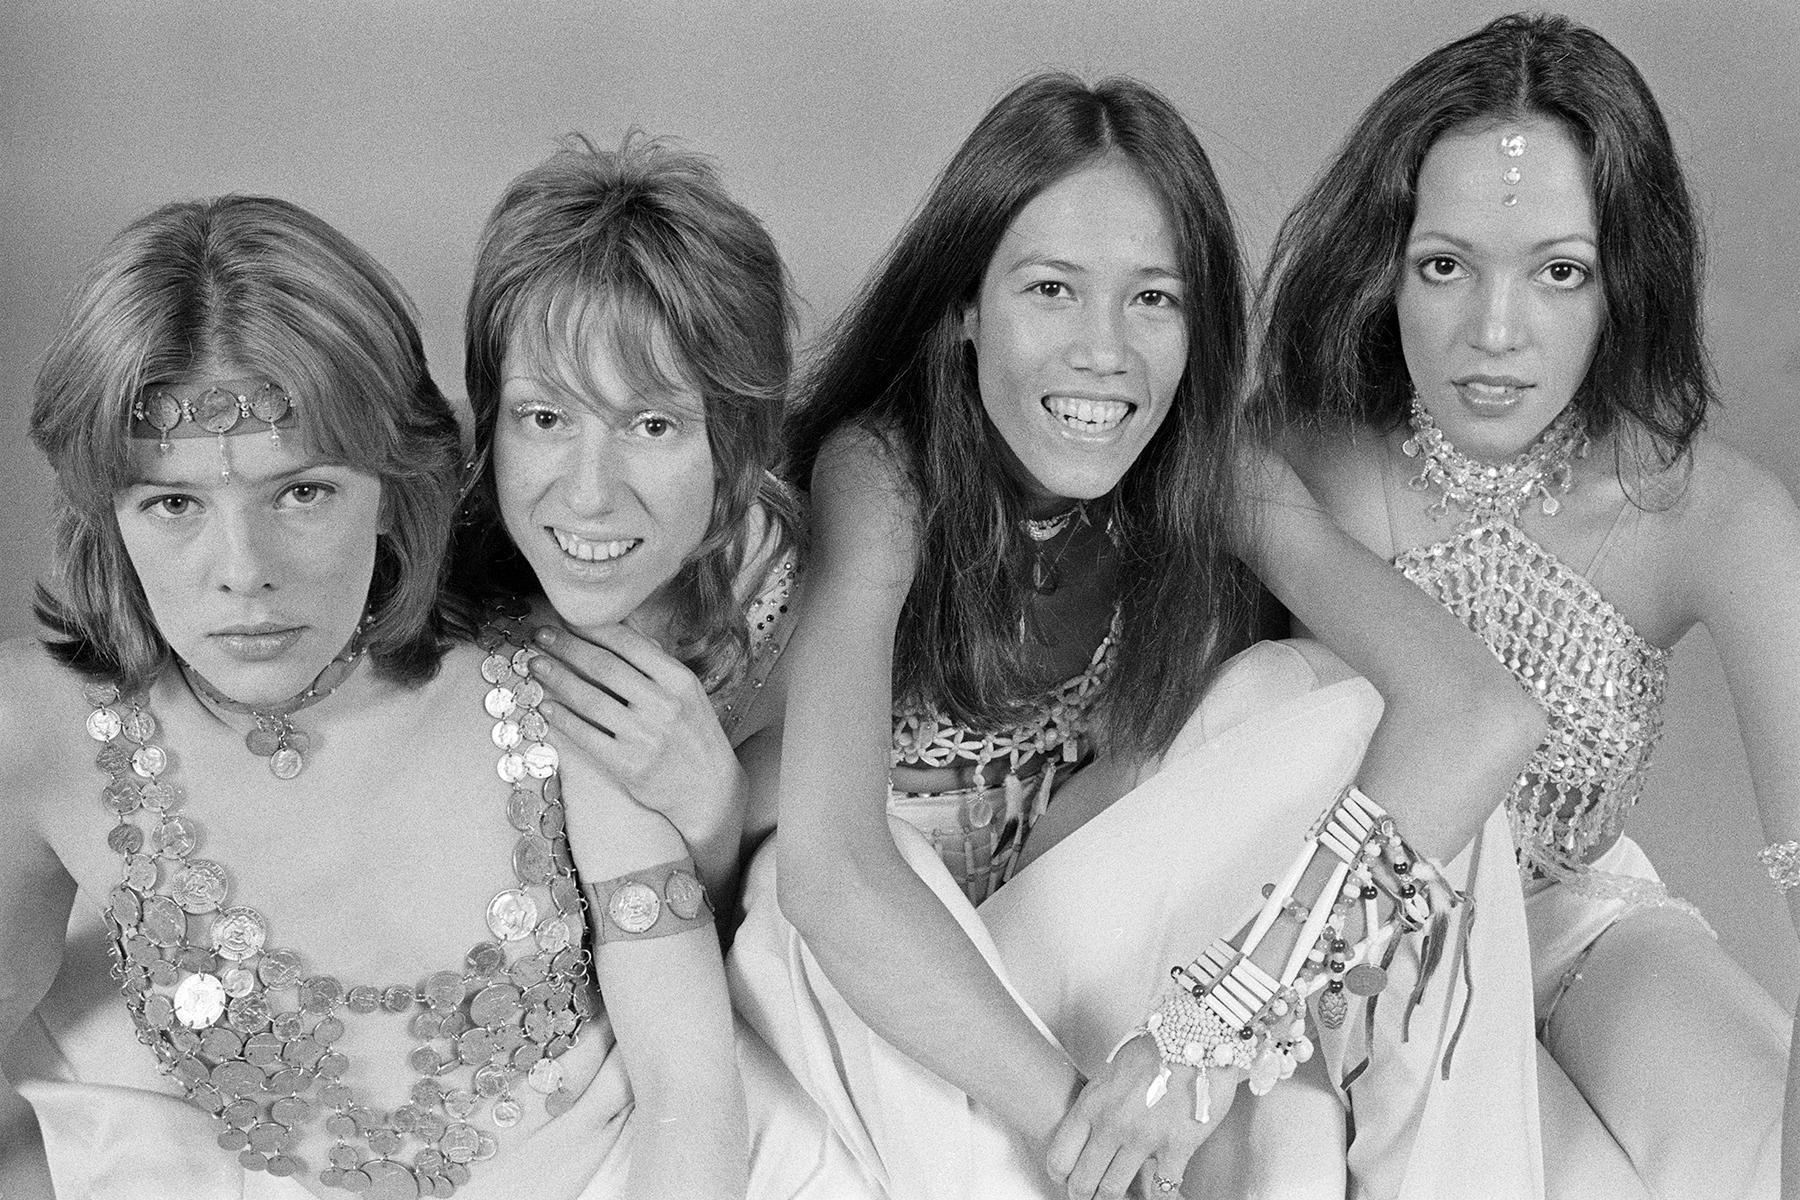 Joe Elliot, Bonnie Raitt, Cherie Currie Talk Fanny's Influence in New Doc